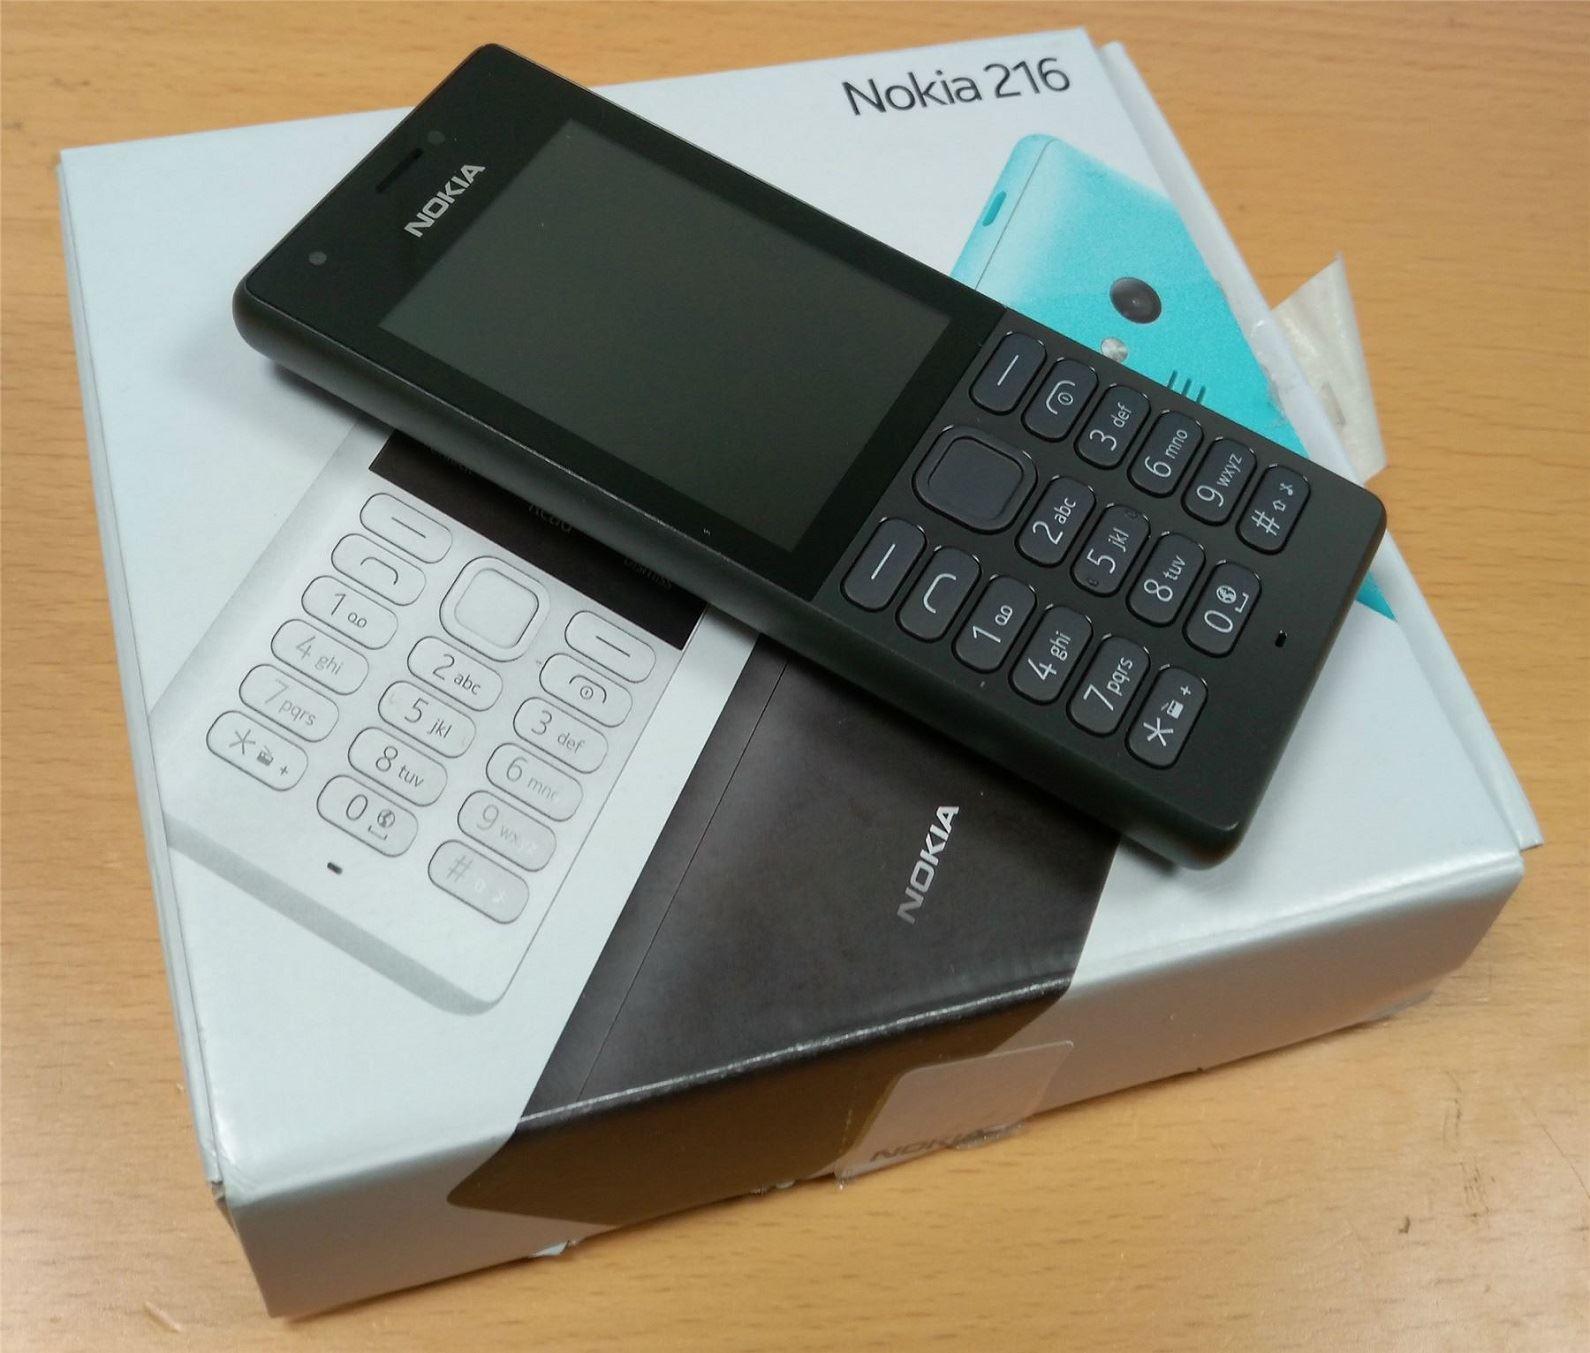 Nokia 216 Pristine Condition Vga Camera Black Boxed Unlocked 105 Single Sim Handphone Sentinel